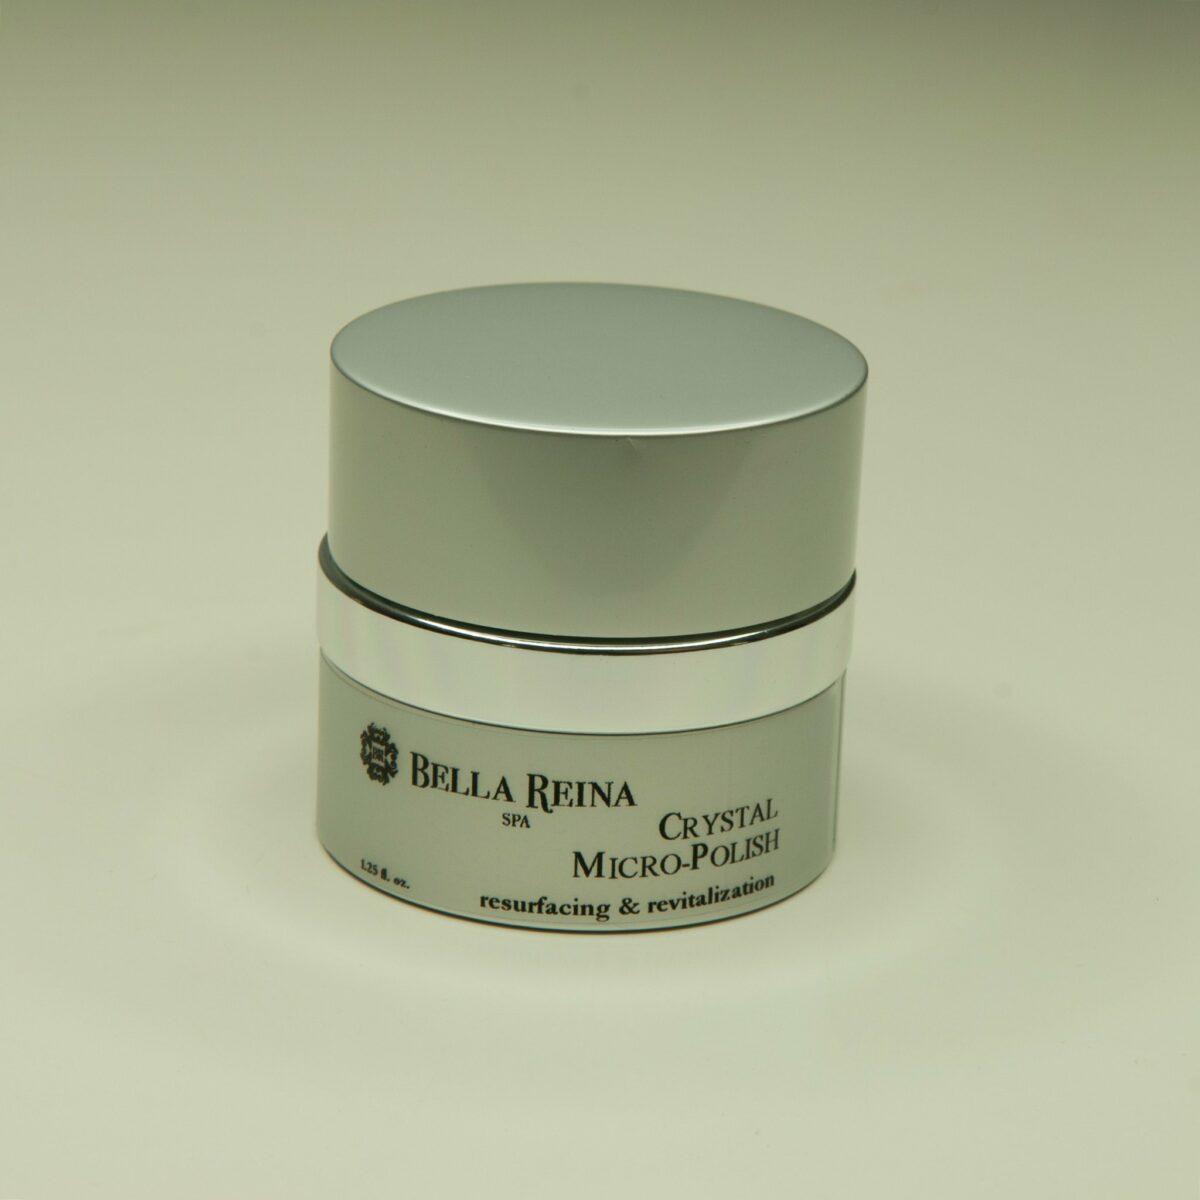 Bella Reina Skincare Facial Crystal Micro-Polish Scrub & Mask - 1.25oz